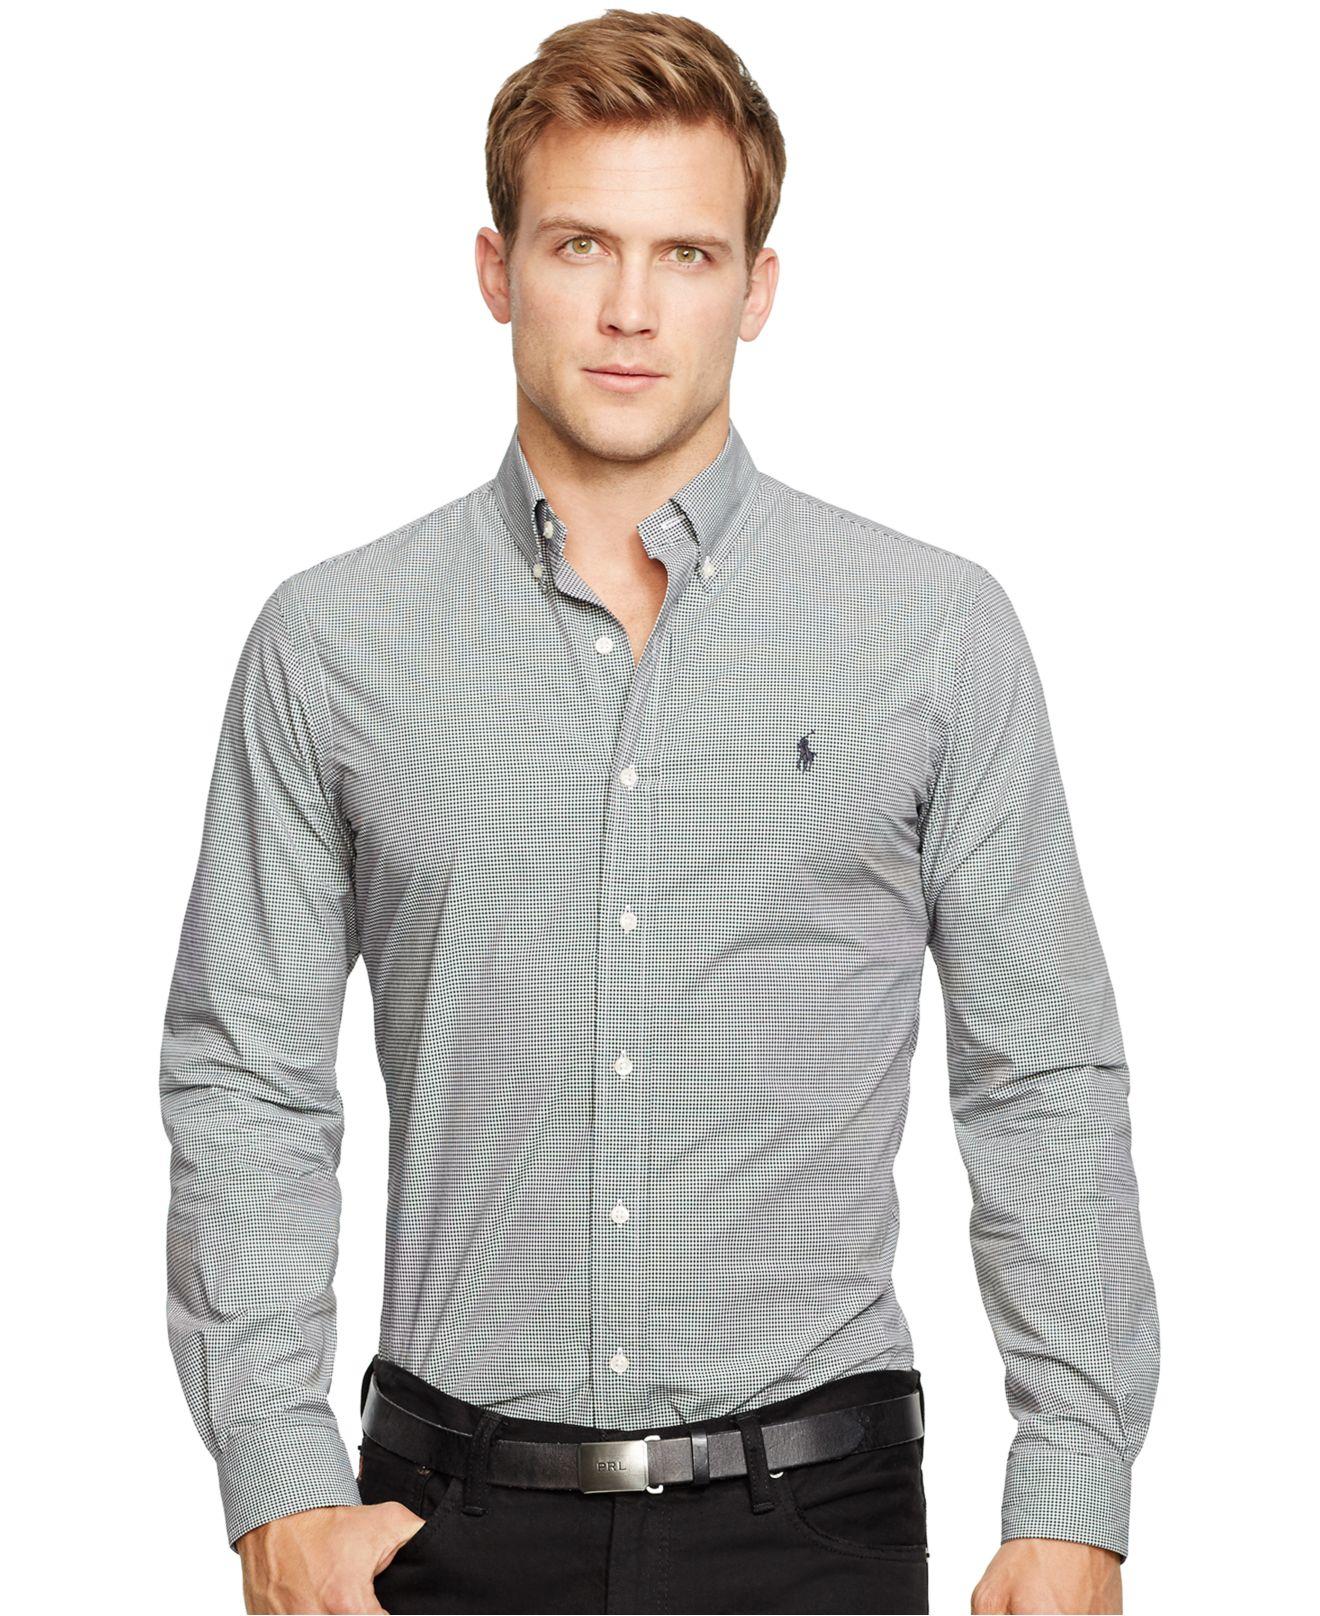 polo ralph lauren slim fit poplin shirt in black for men black white. Black Bedroom Furniture Sets. Home Design Ideas